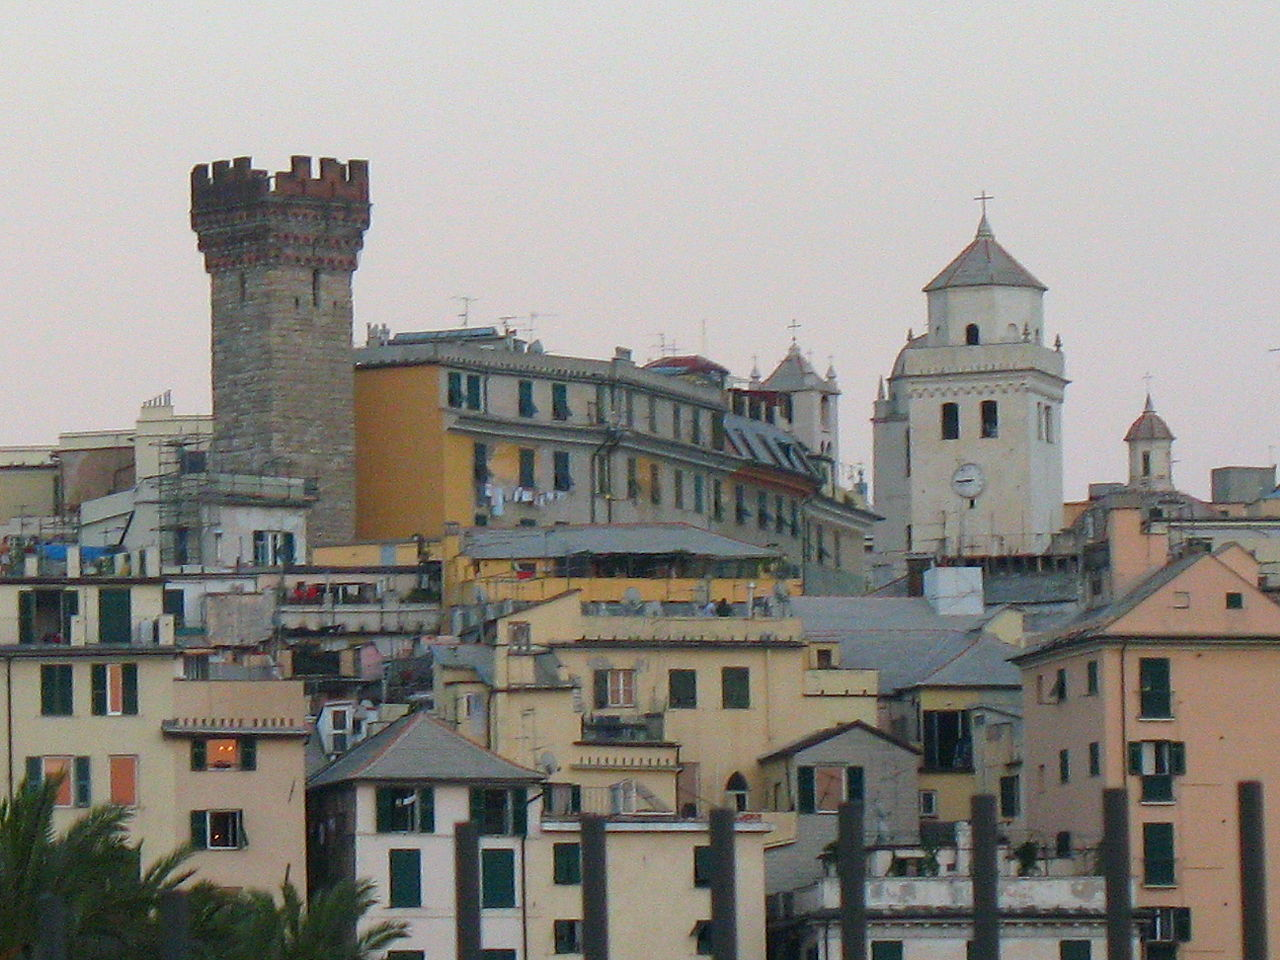 1280px-Genova-centro_storico-IMG_1503